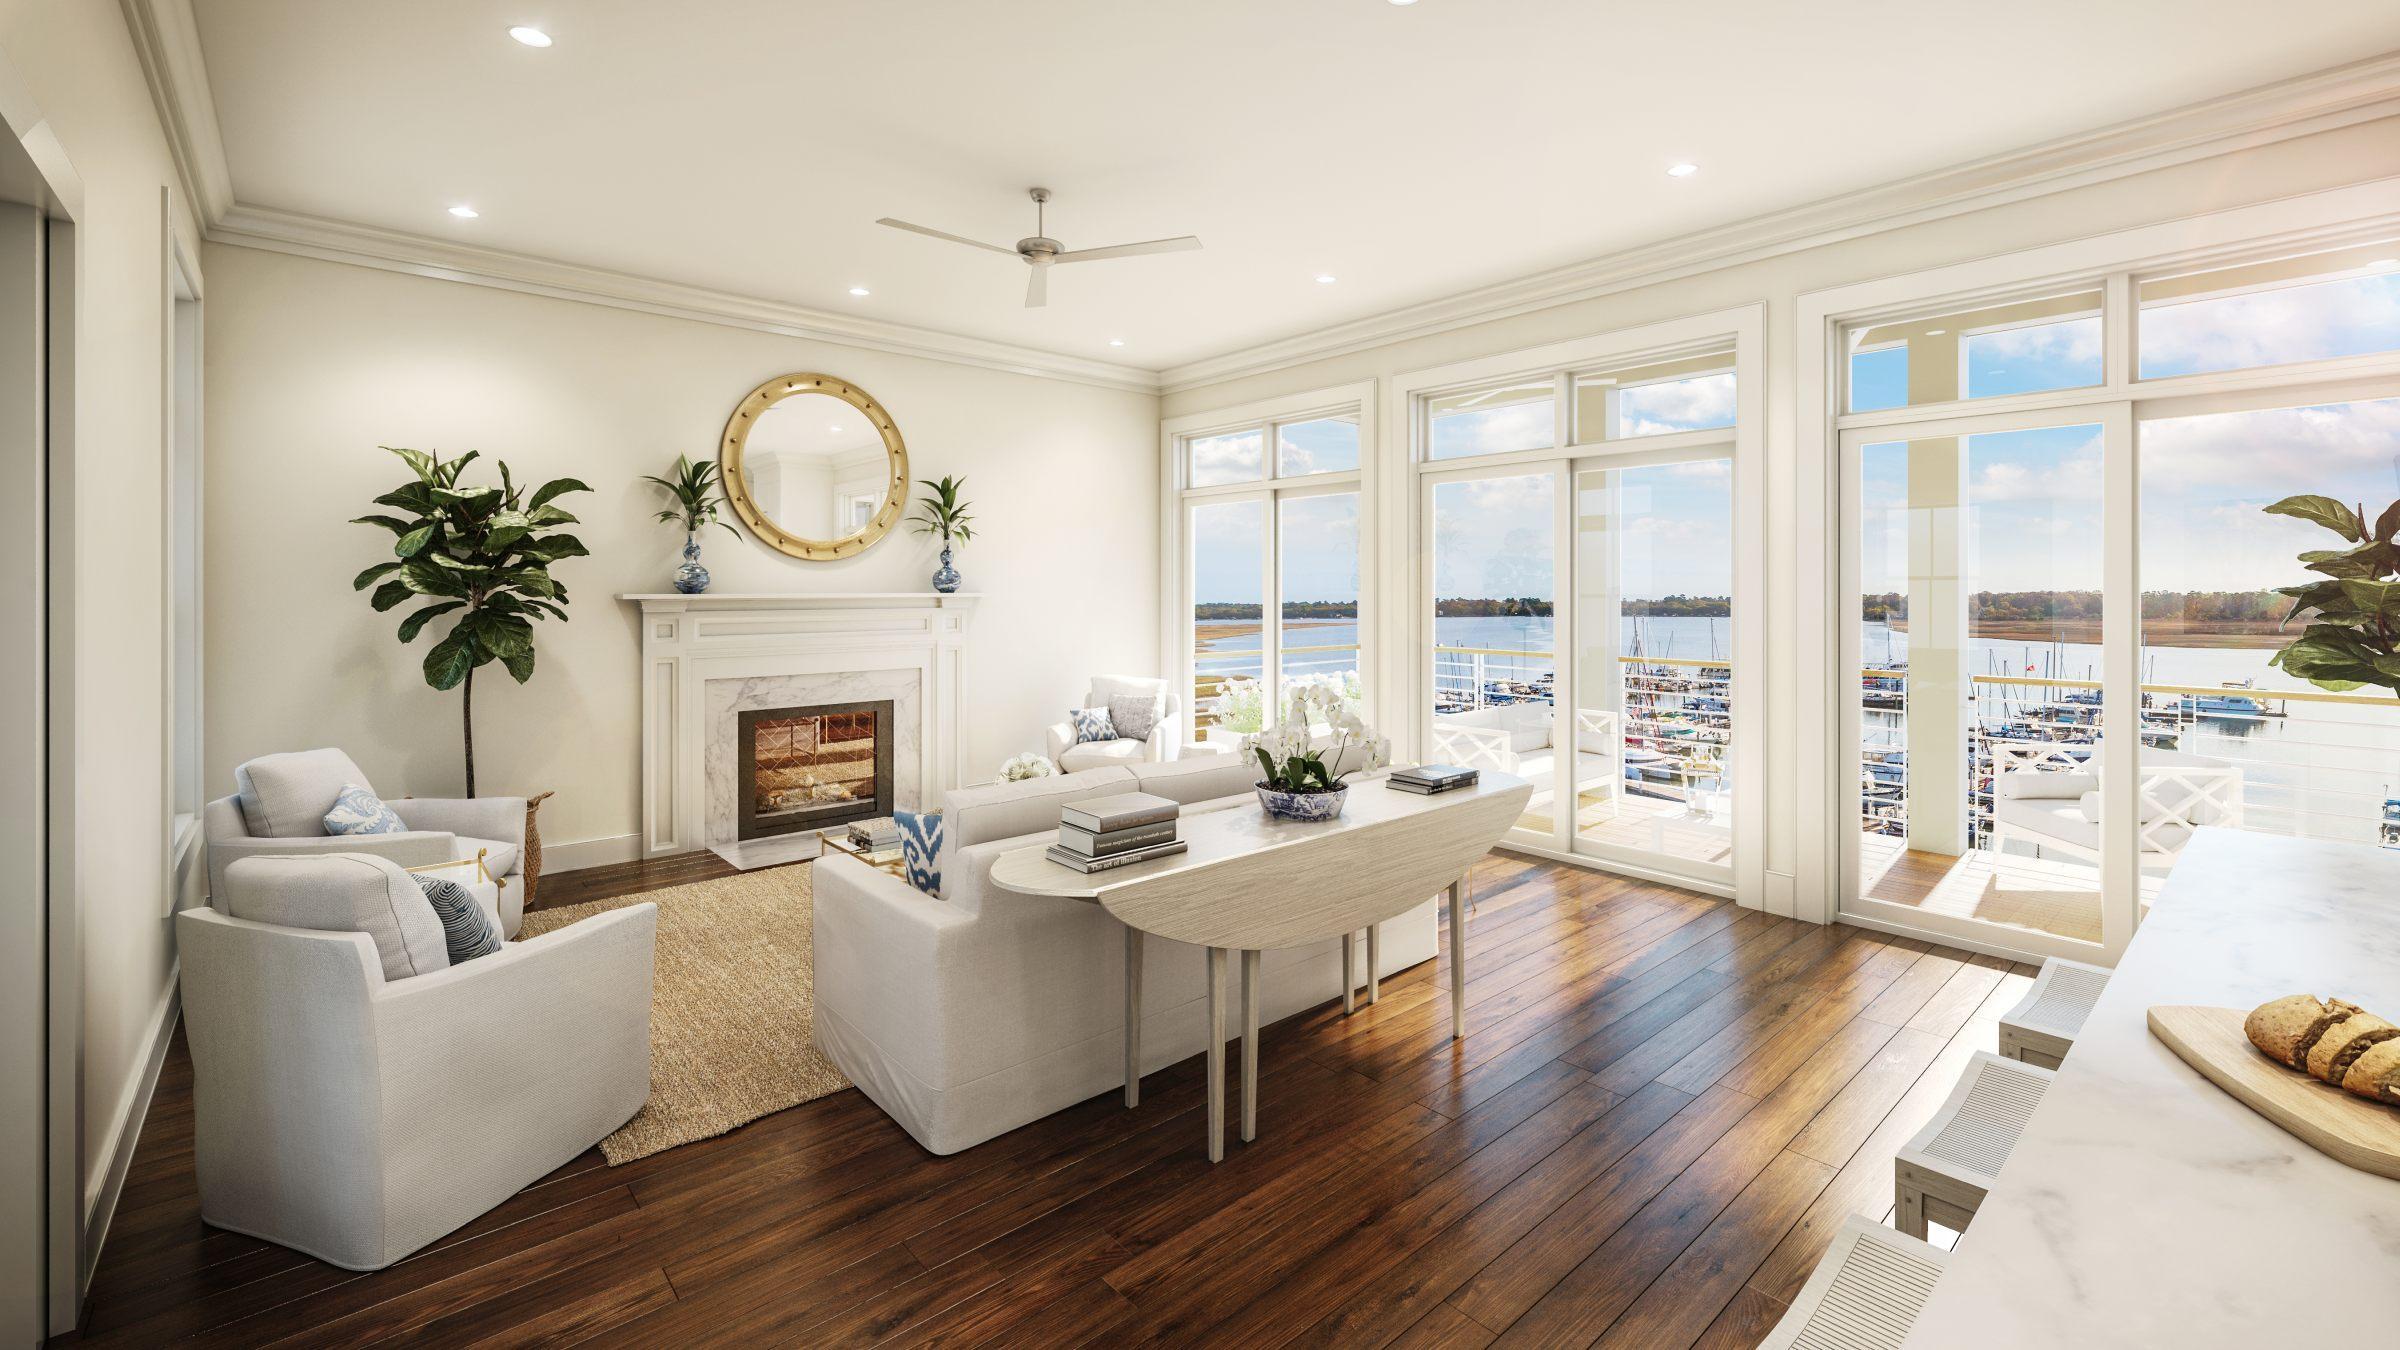 St. Johns Yacht Harbor Homes For Sale - 2408 Maybank, Johns Island, SC - 5